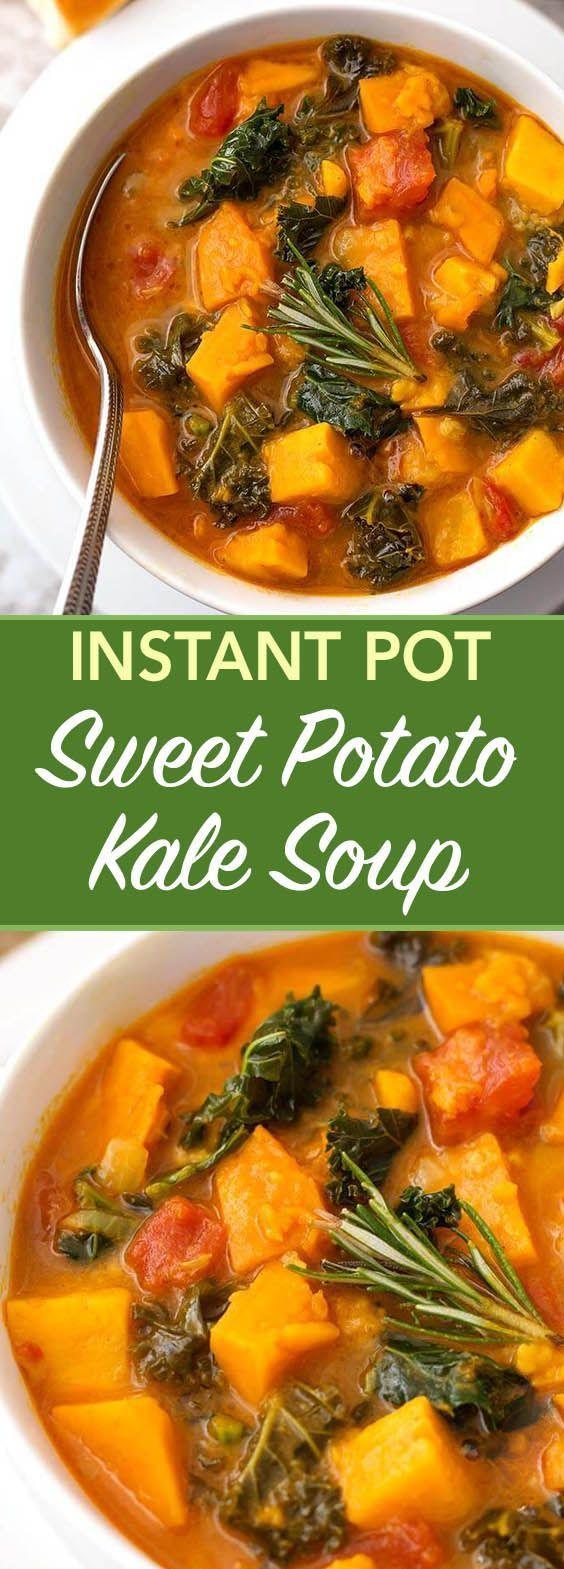 Instant Pot Sweet Potato Kale Soup | Simply Happy Foodie